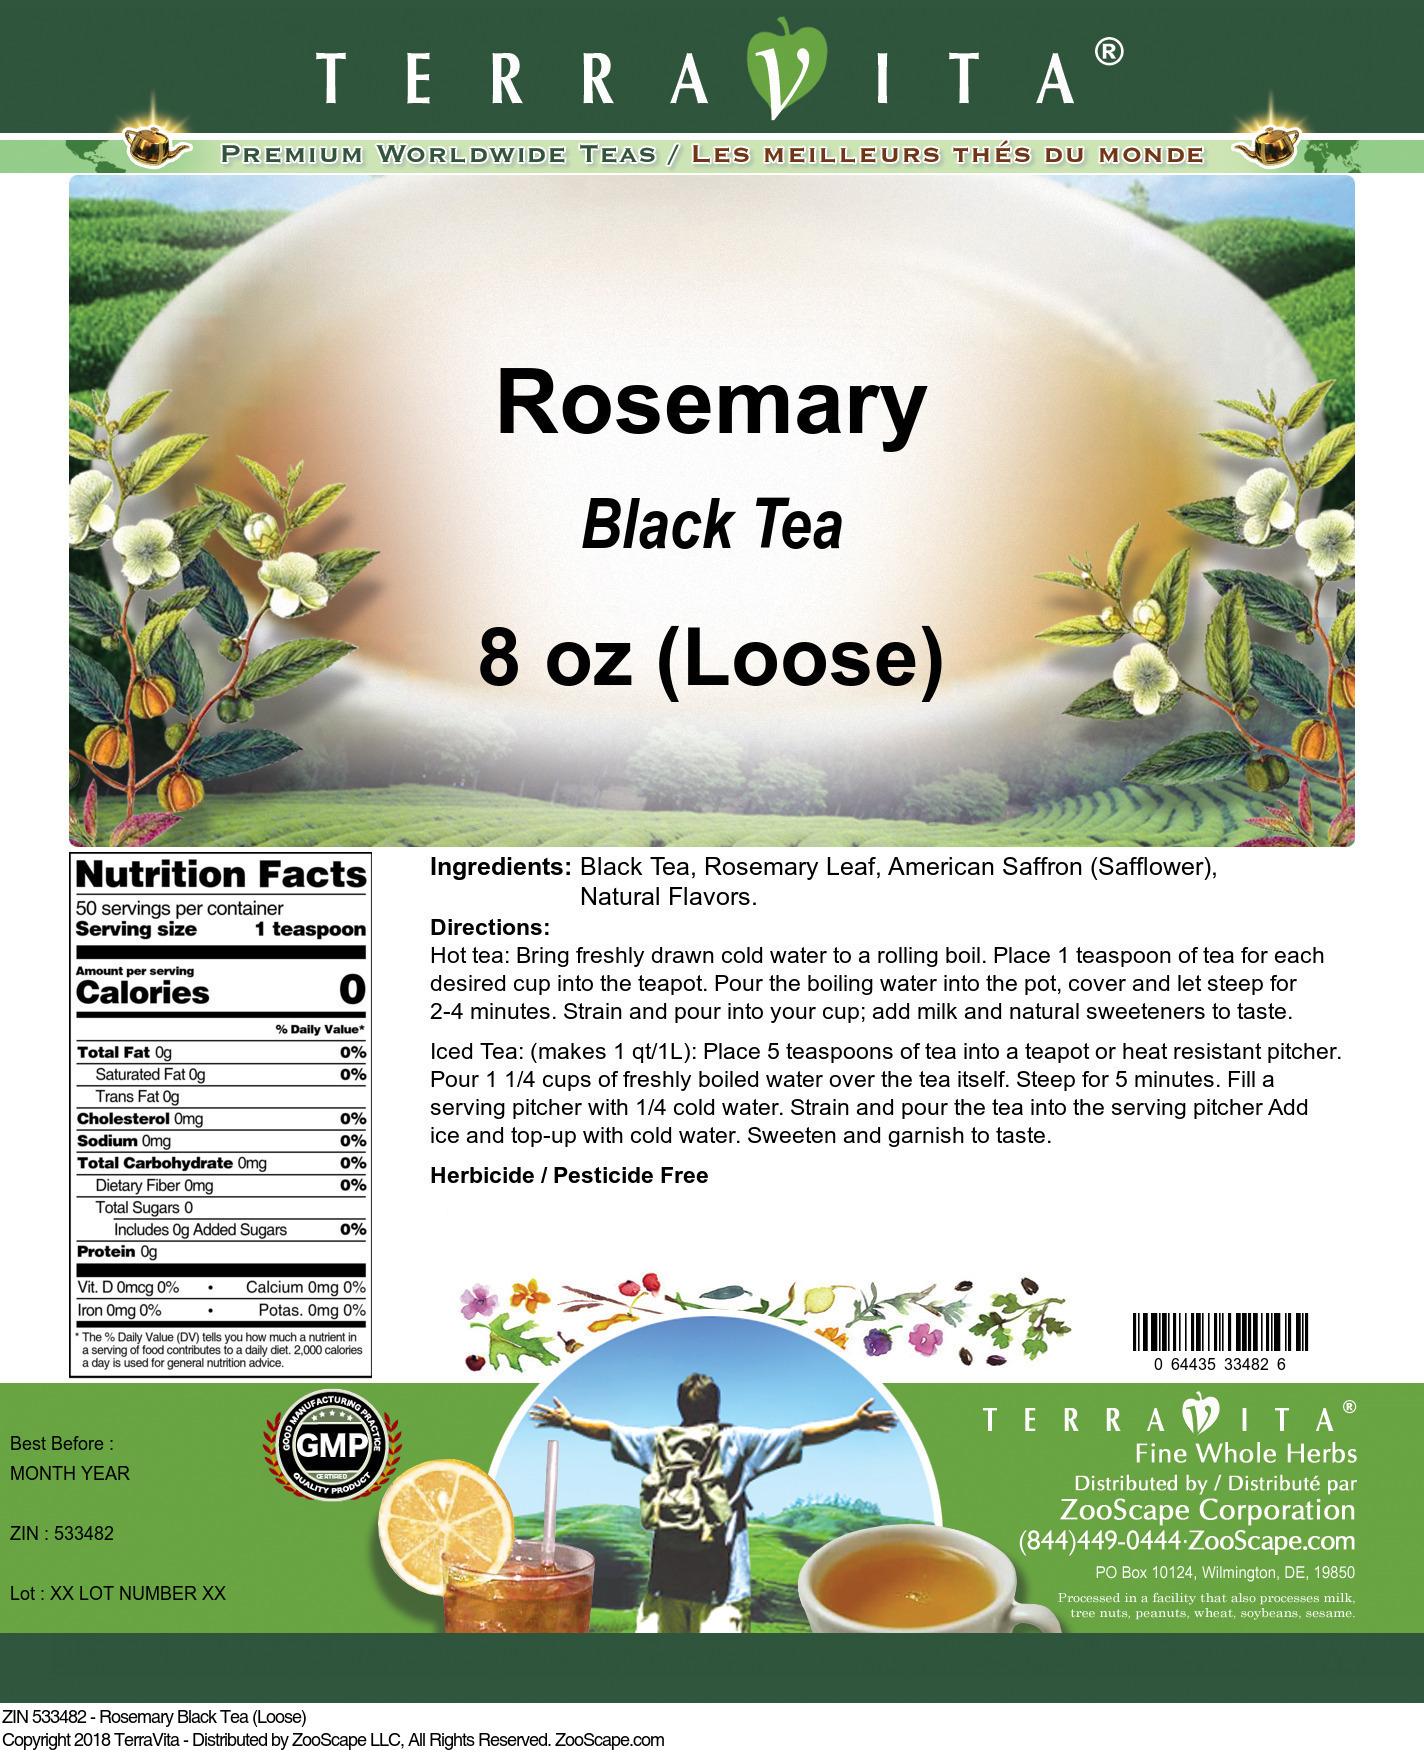 Rosemary Black Tea